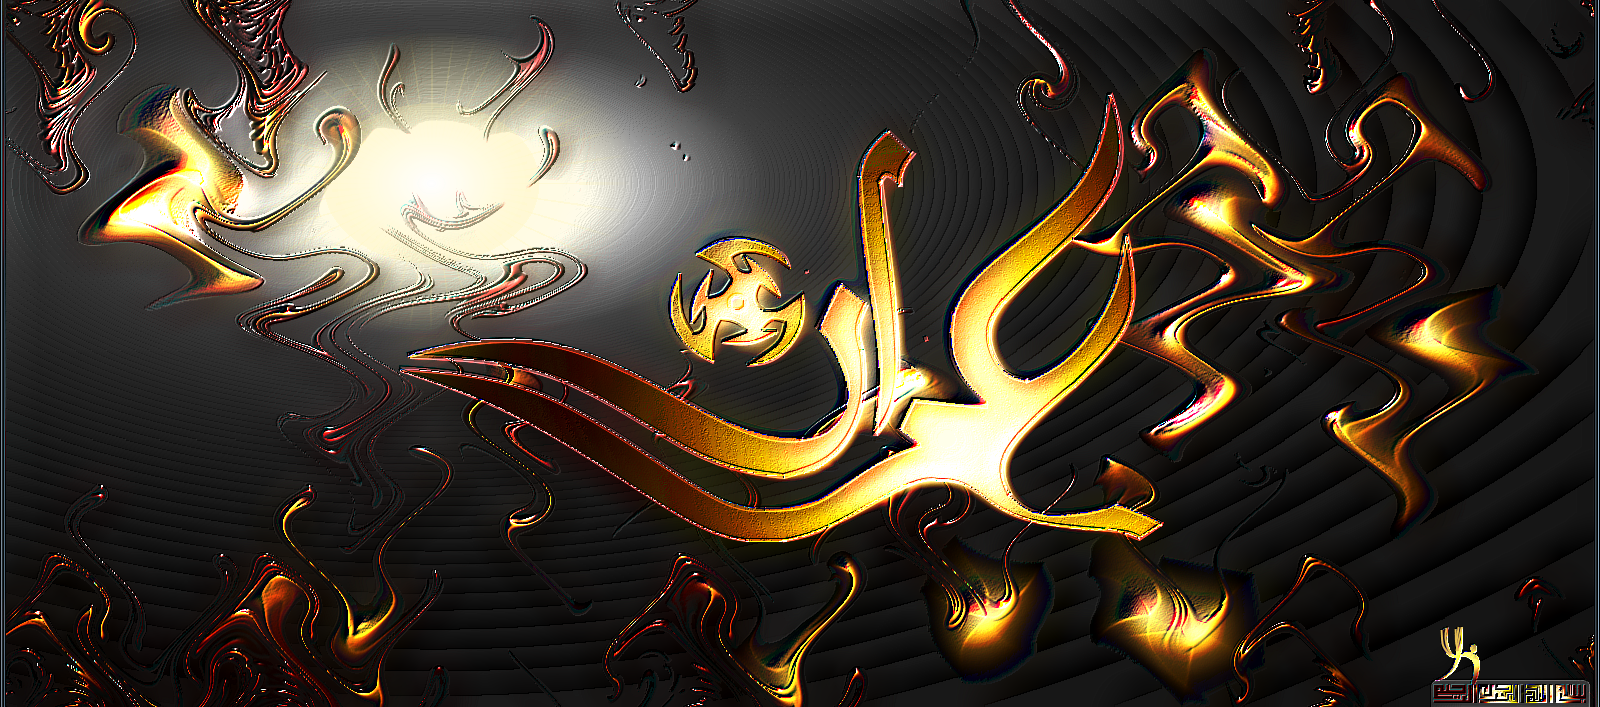 Wonderful Wallpaper Name Arabic - a2ddab9b33e71e198c95a5efae675ac0  Photograph_948745.png